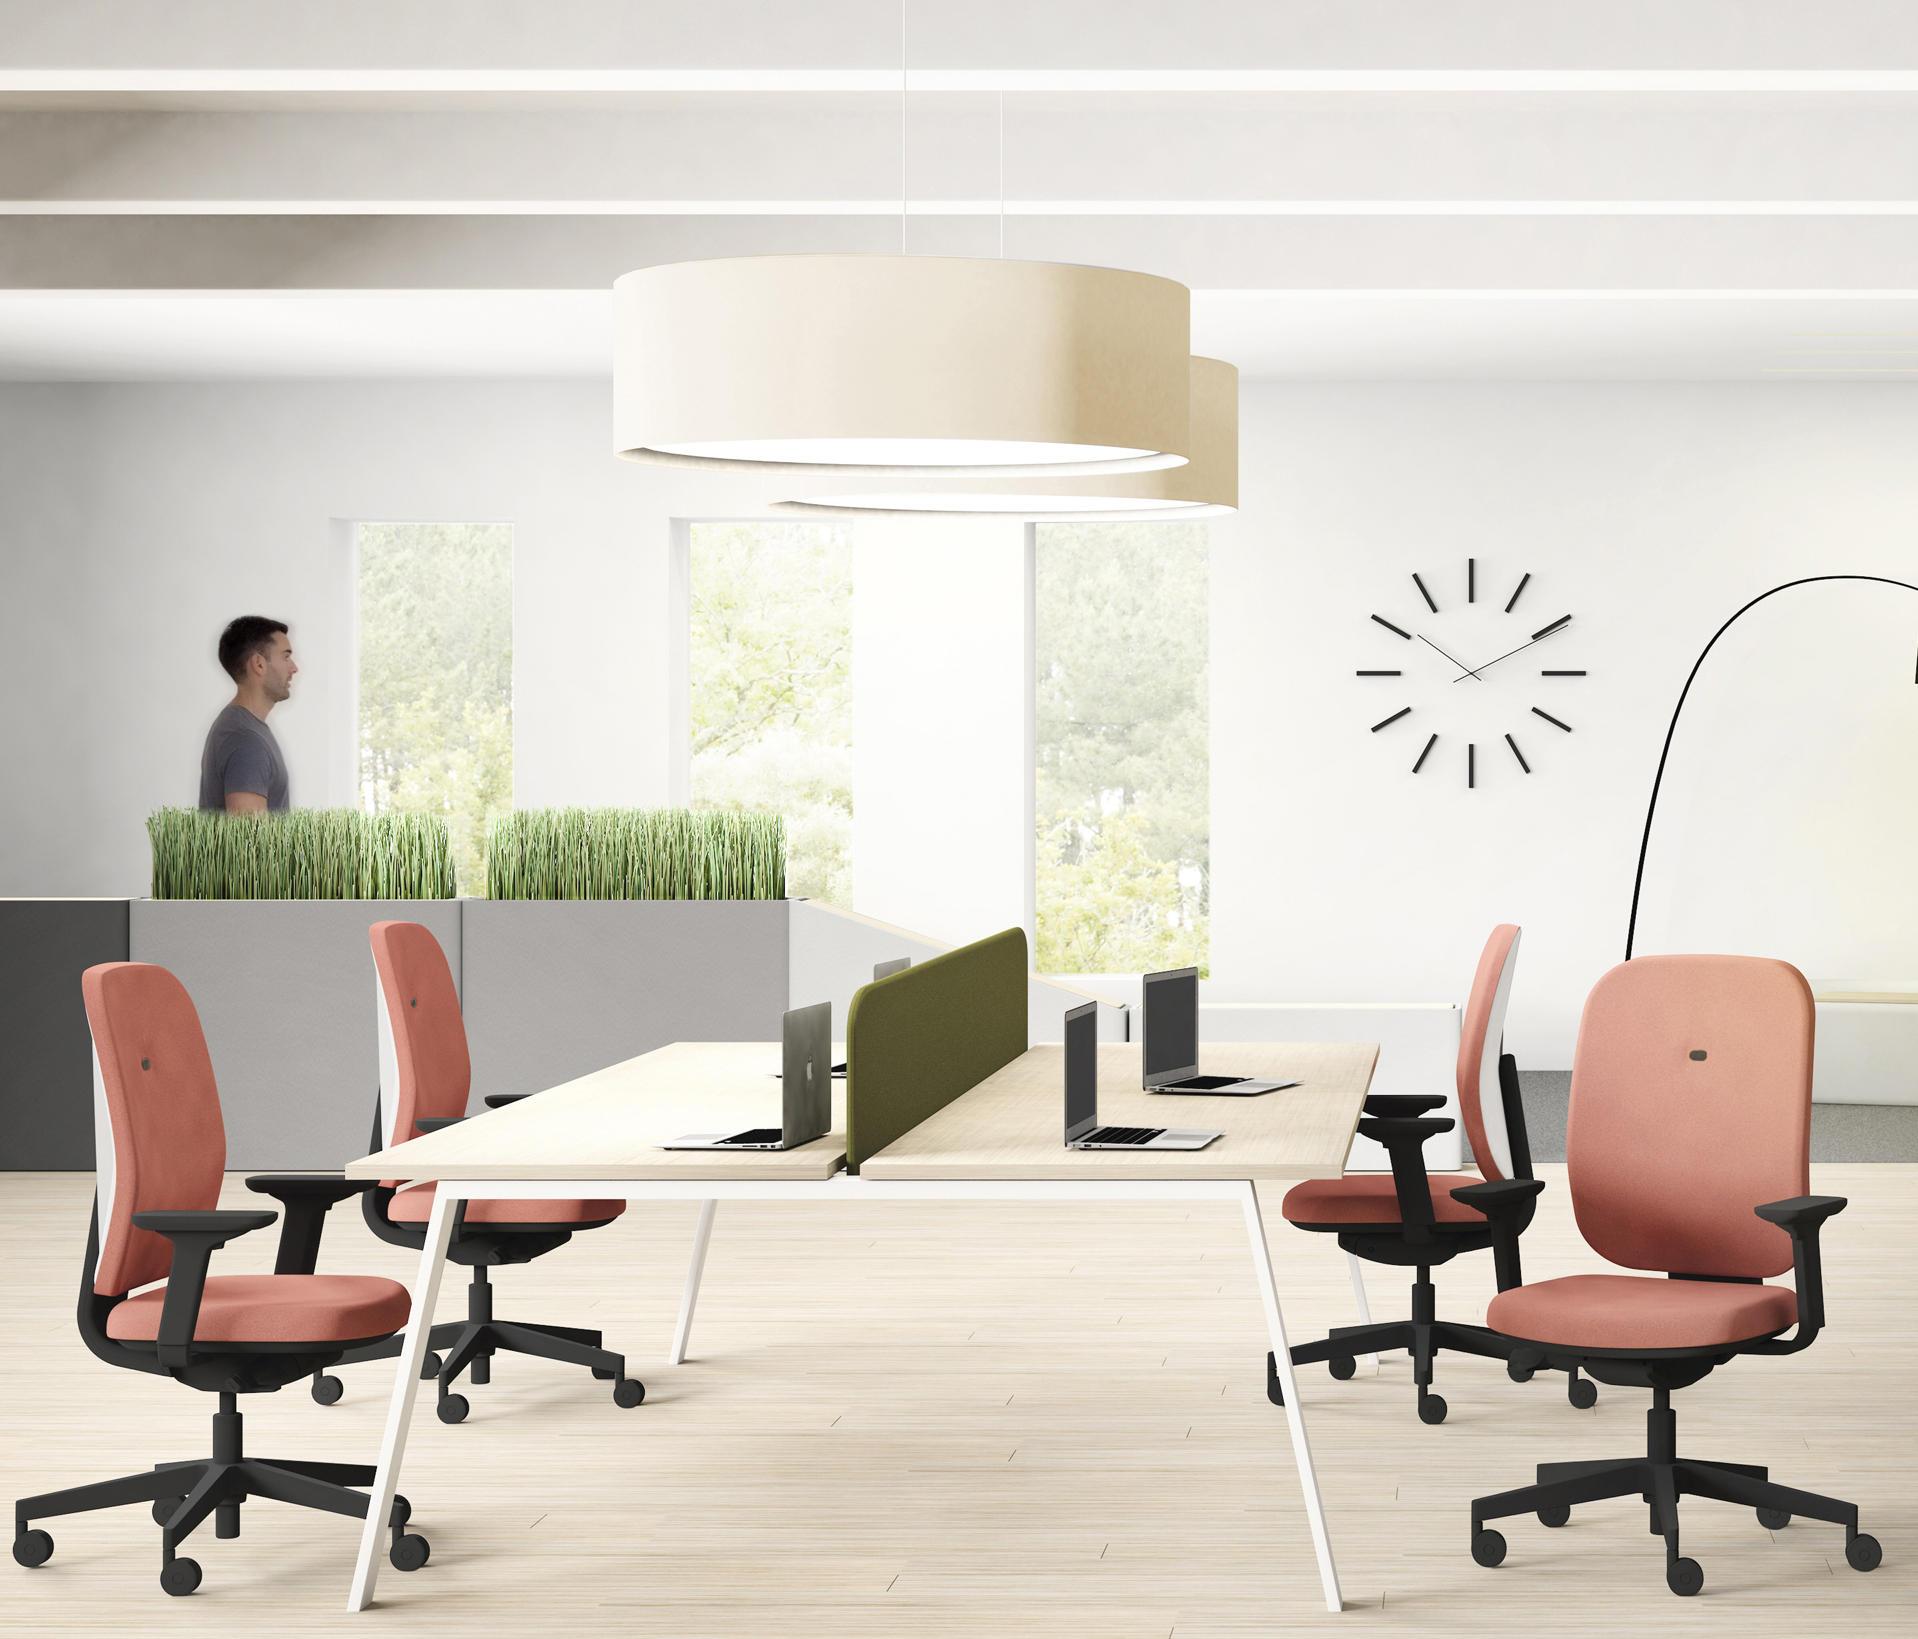 Alaia chaises de travail de sokoa architonic for Sokoa hendaye